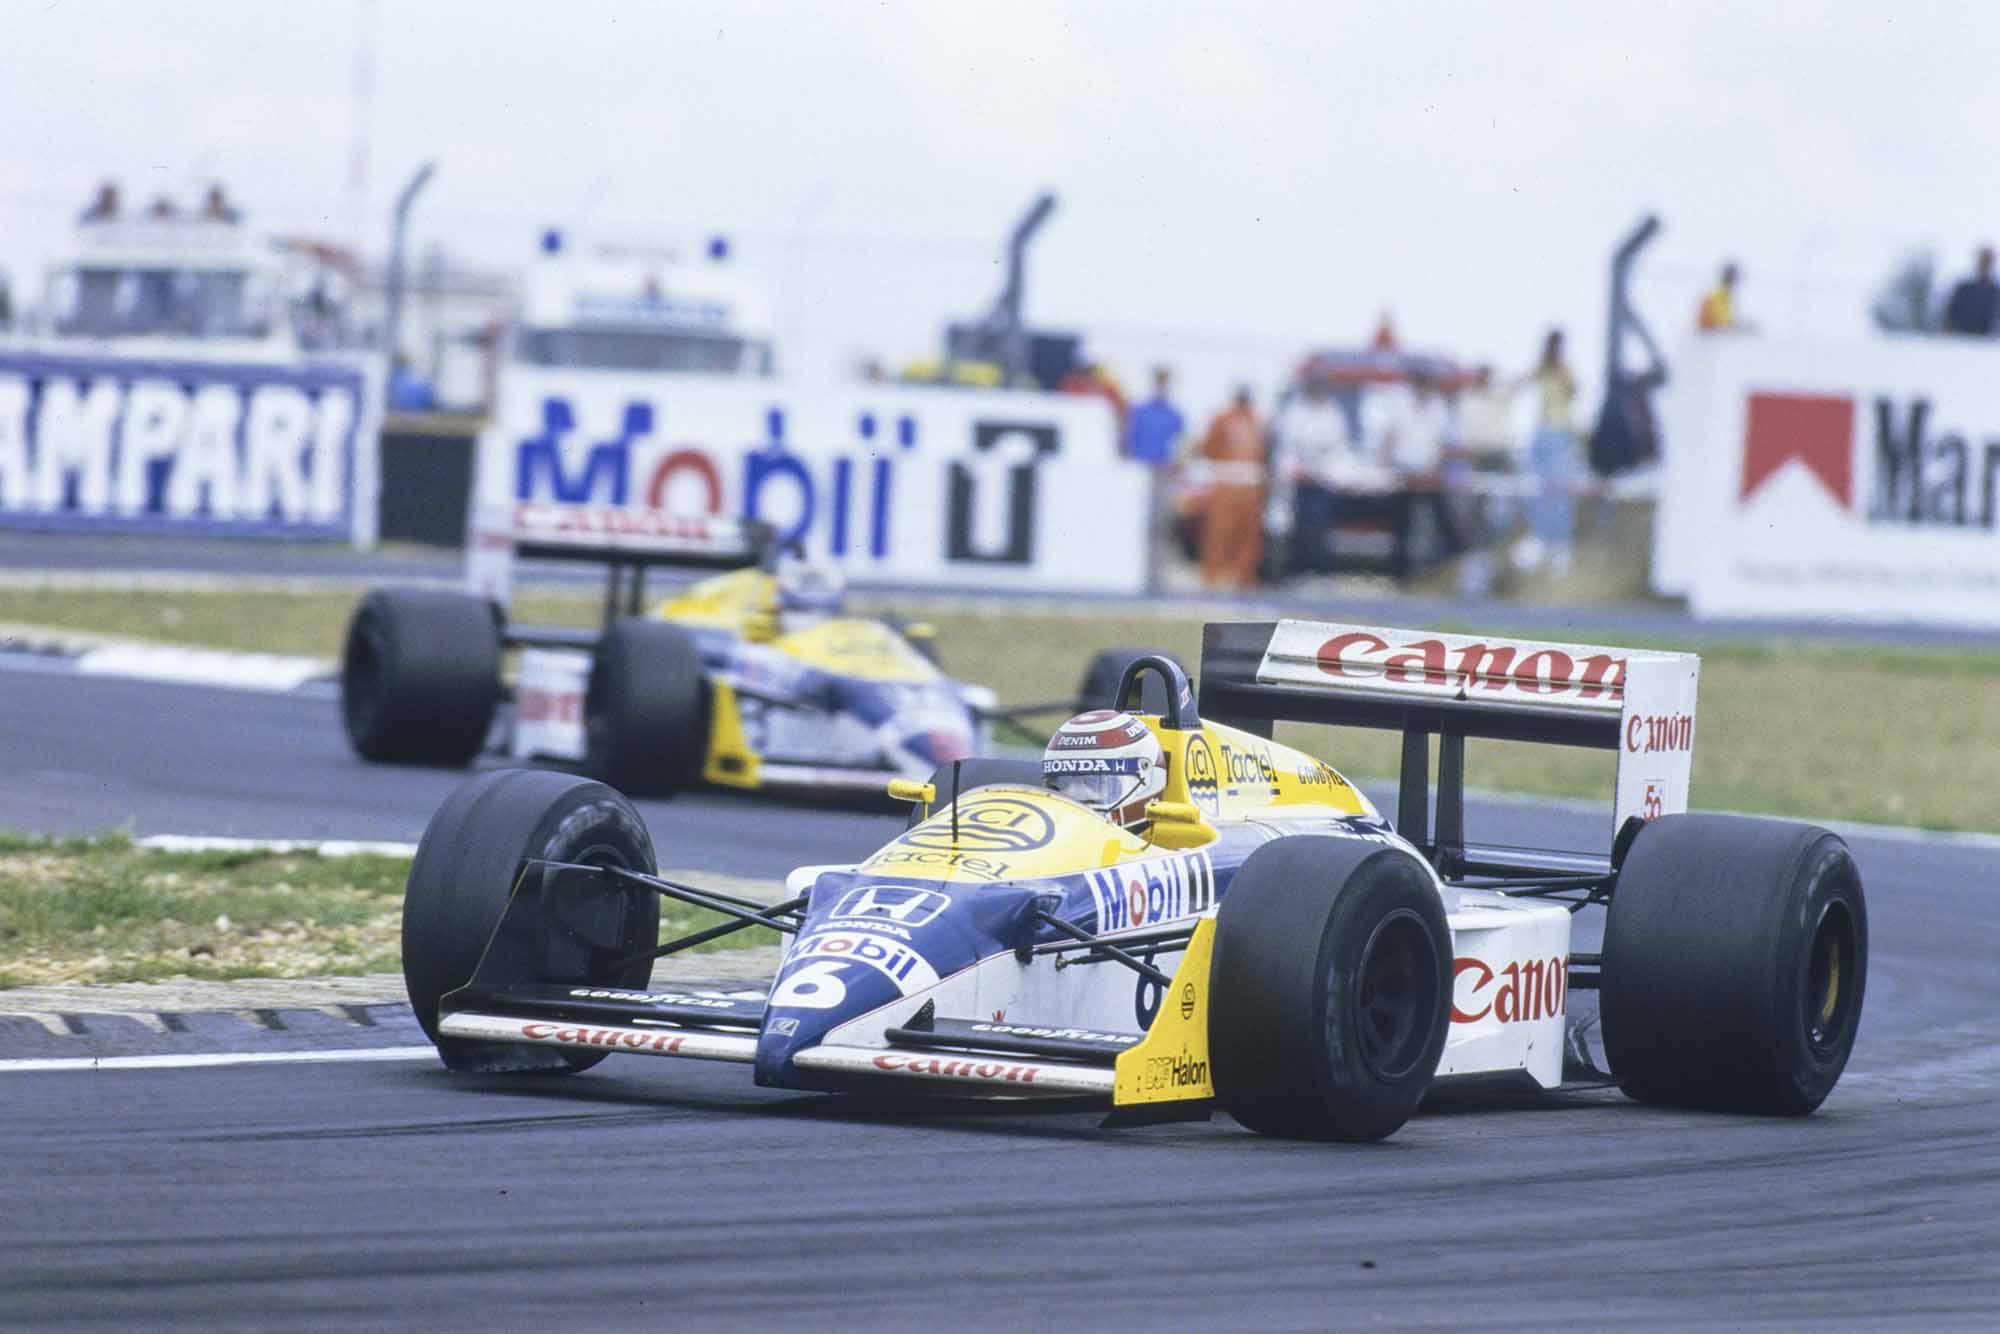 Nelson Piquet leads Nigel Mansell during their 1987 British Grand Prix Silverstone battle